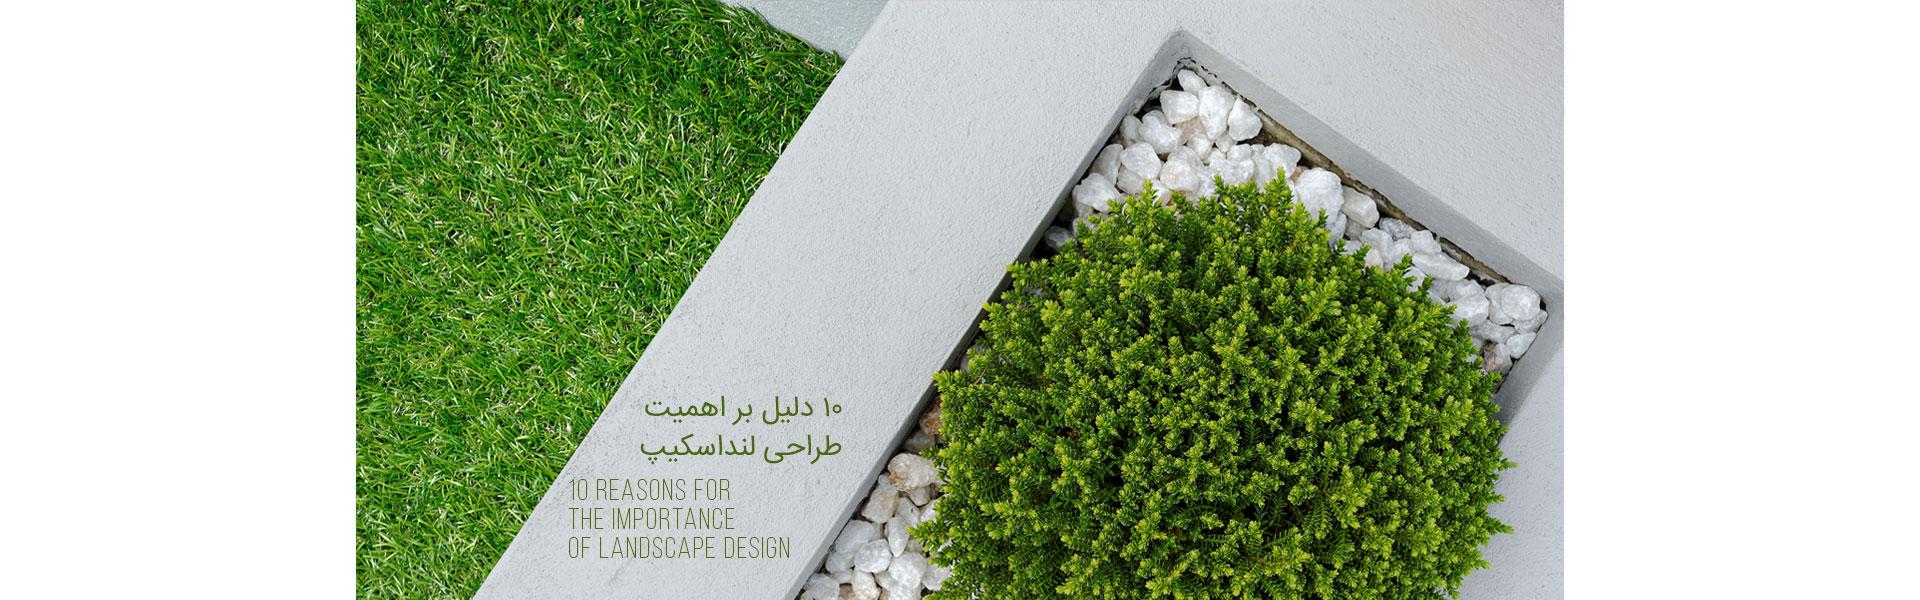 landscape ahamiyat tarahi1 - ۱۰ دلیل بر اهمیت طراحی لنداسکیپ